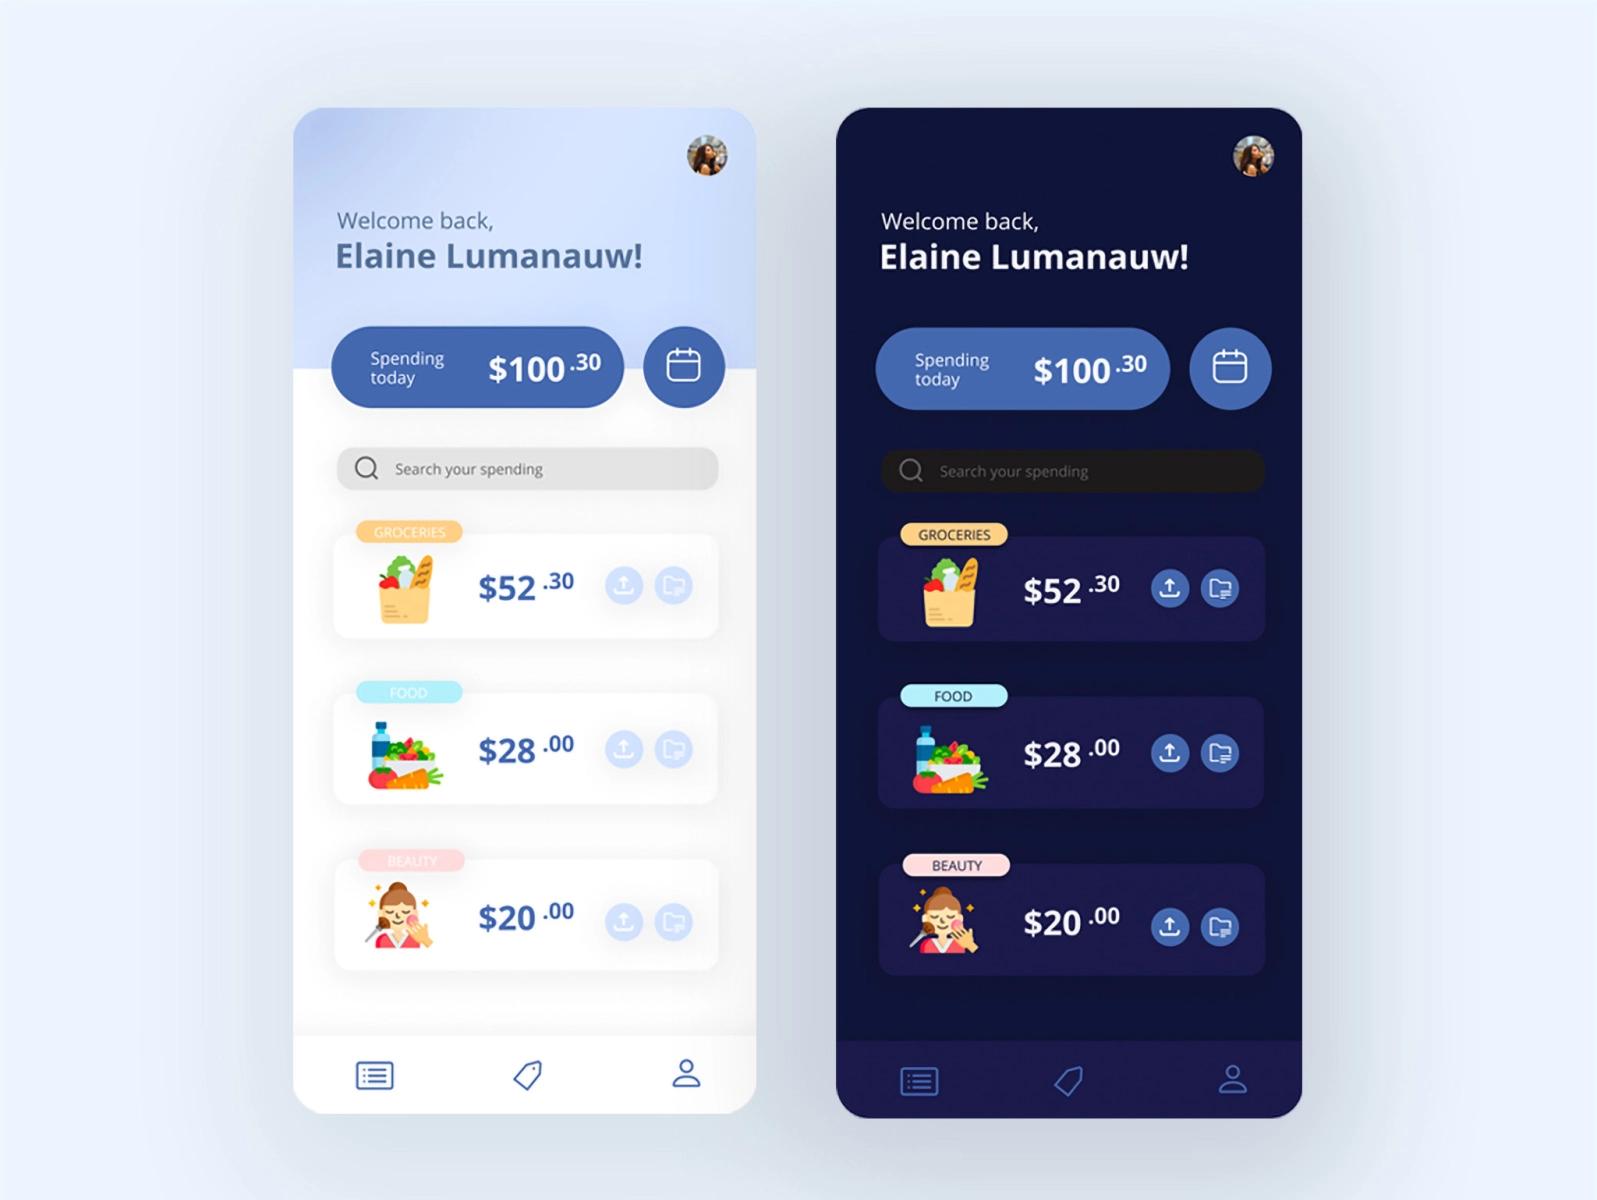 A minimal home screen design for a spending tracker app in flutter